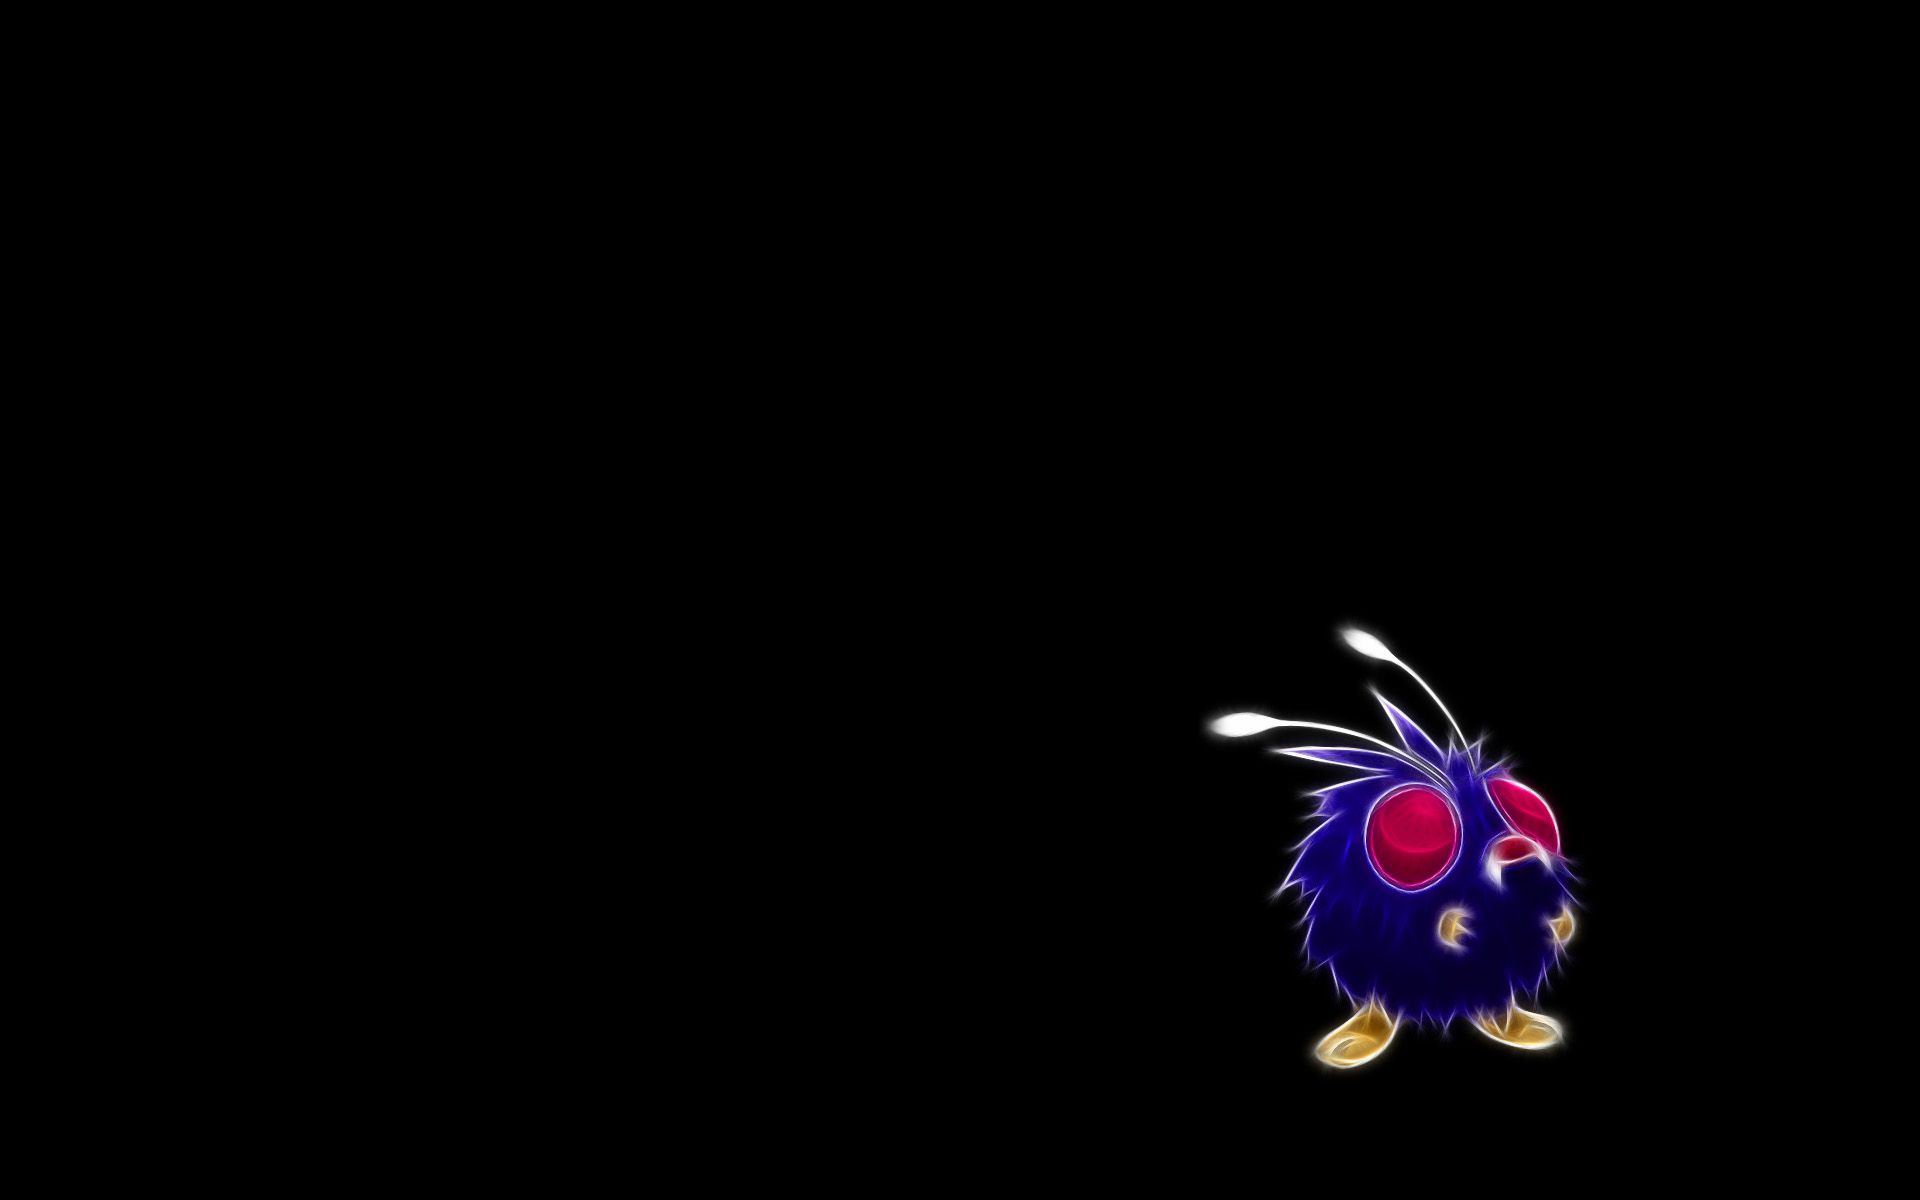 venonat pokemon anime pocketmonster neon 1920x1200 1920x1200